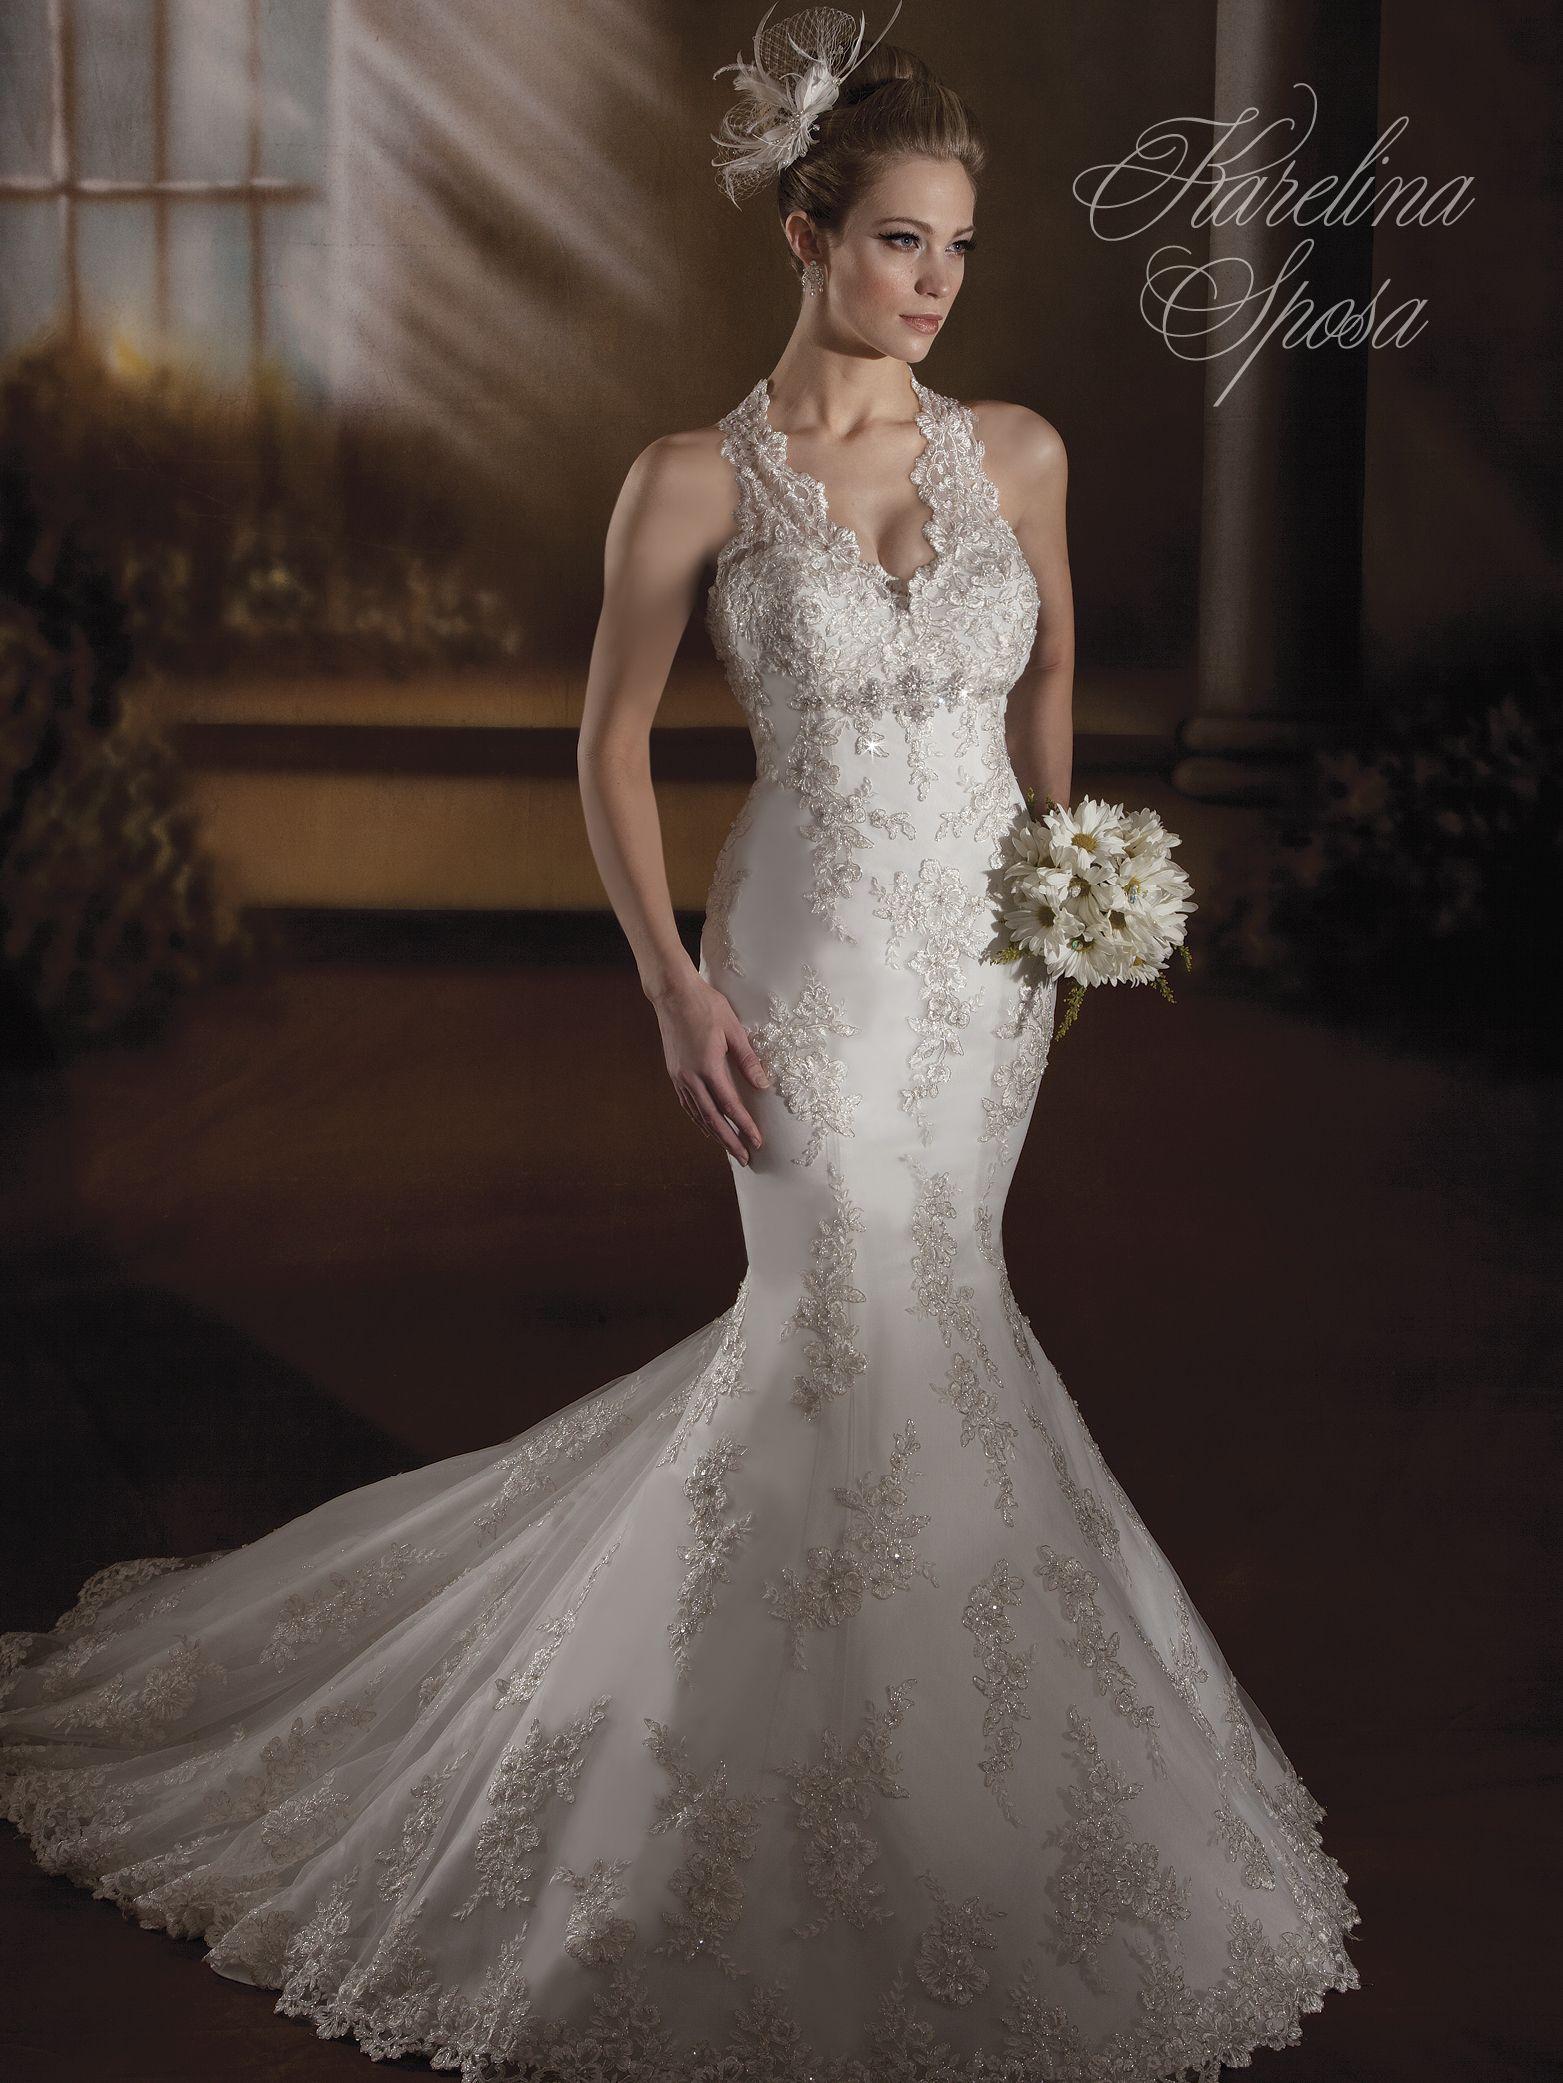 Karelina sposa style c7872 french tulle v neck halter for French style wedding dresses